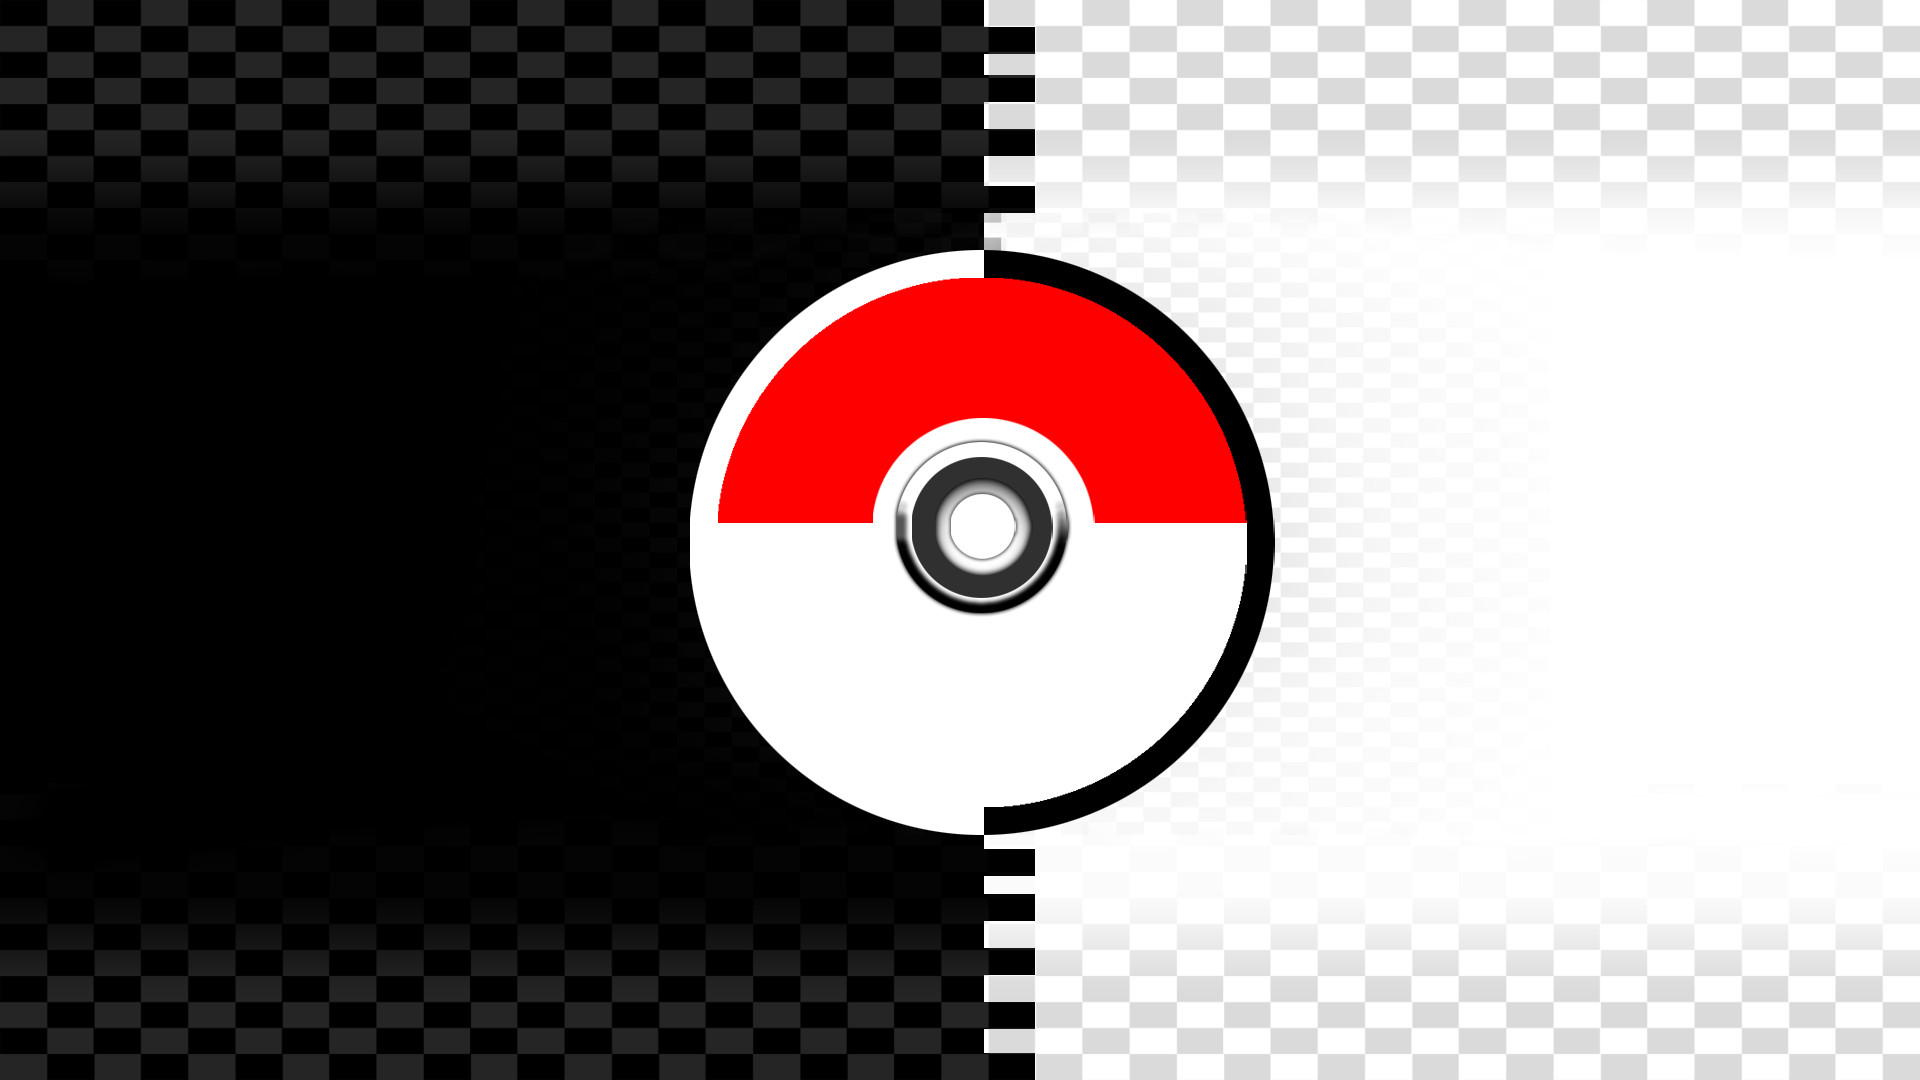 Pokemon Black And White Wallpaper.